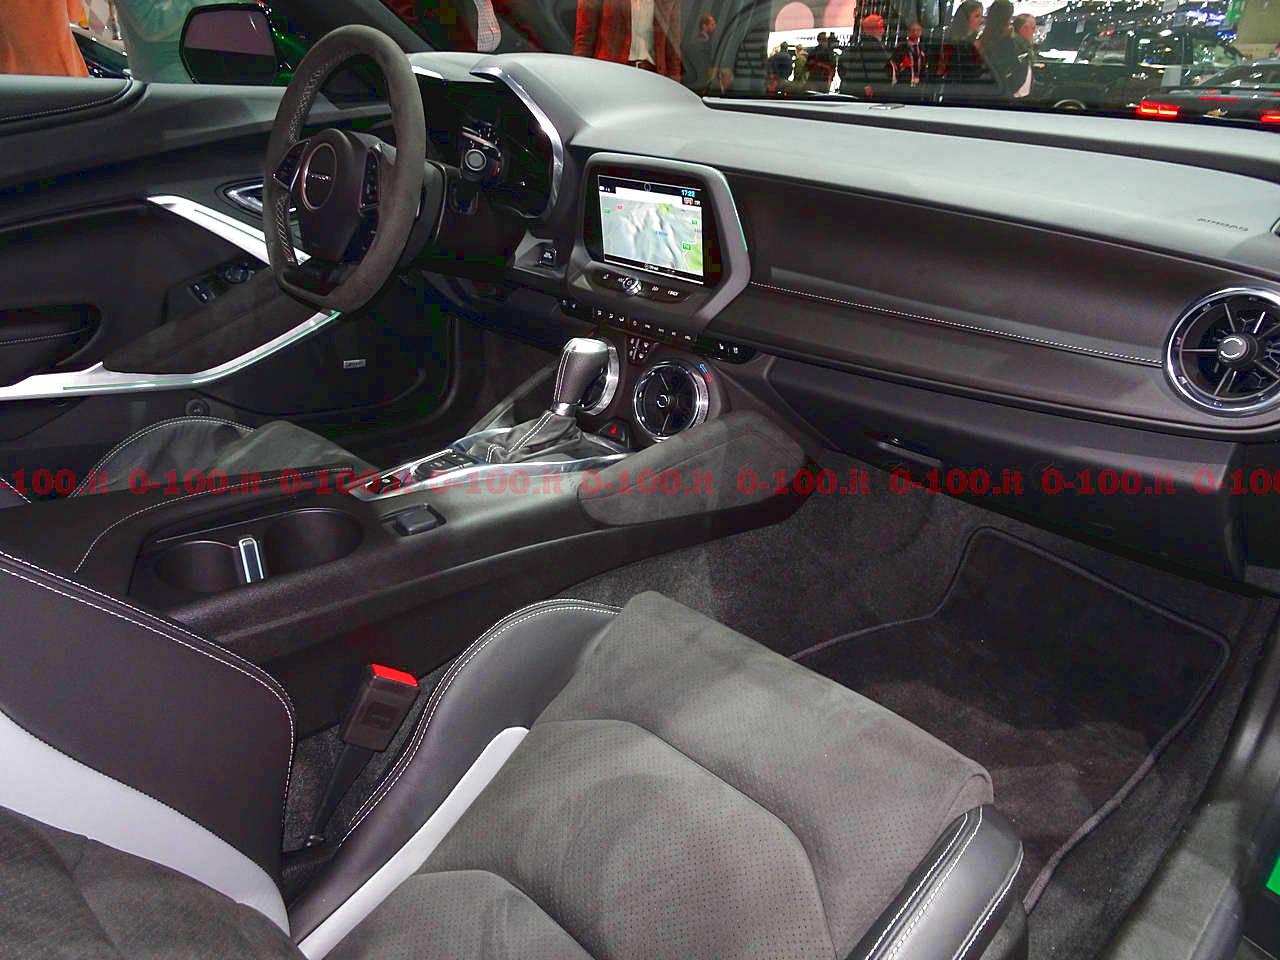 Ginevra-geneva-geneve-2017-Chevrolet-Camaro-Track-Concept-0-100_14